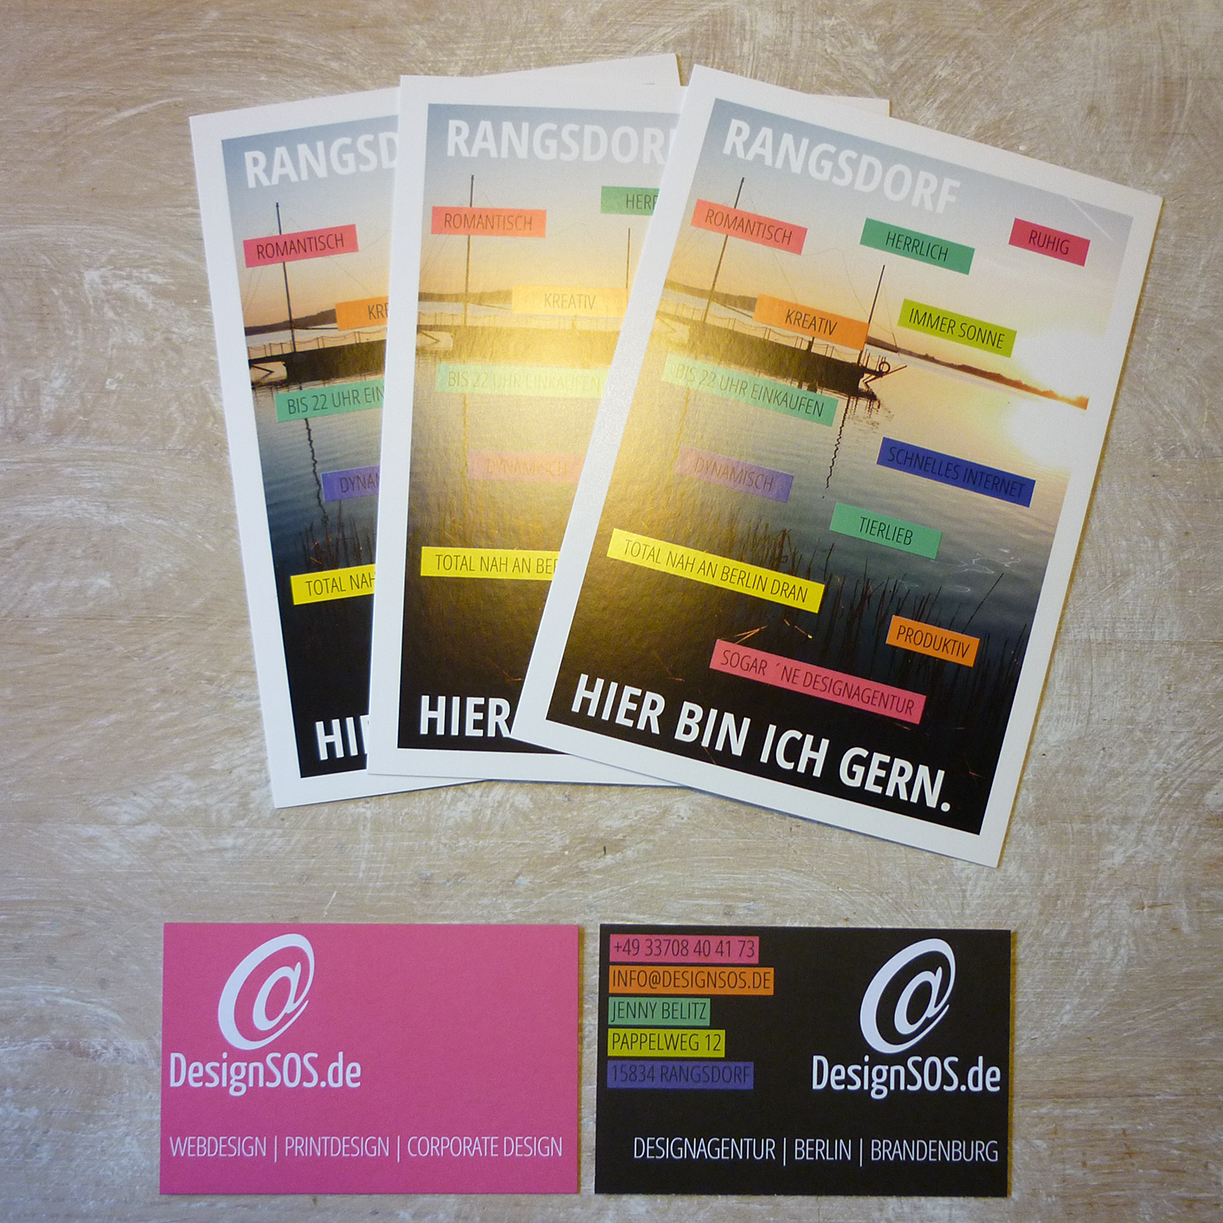 designsos-design-postkarten